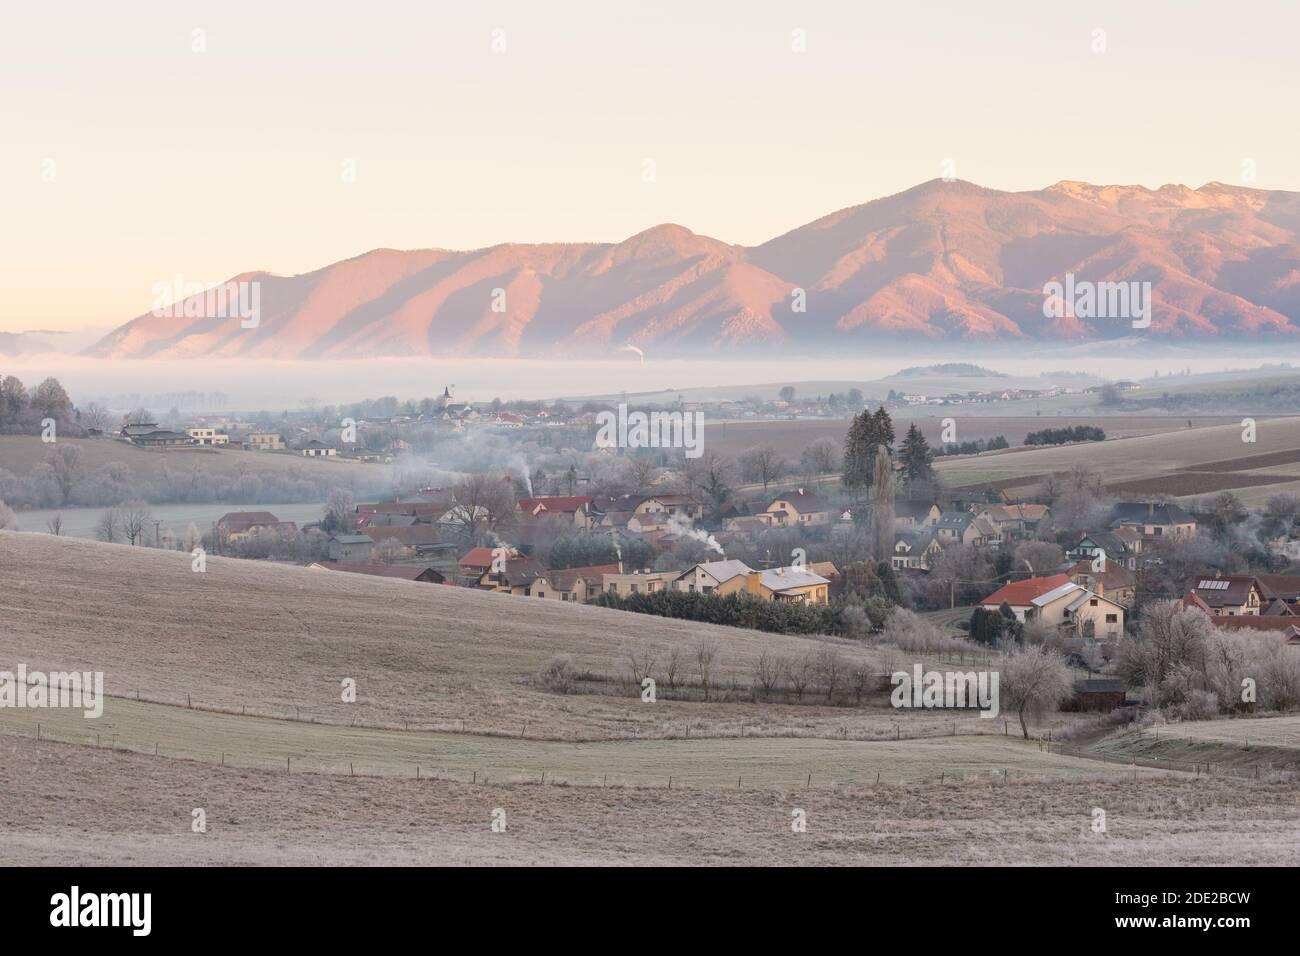 Dorf Horny Kalnik und Mala Fatra Gebirge, Slowakei. Stockfoto